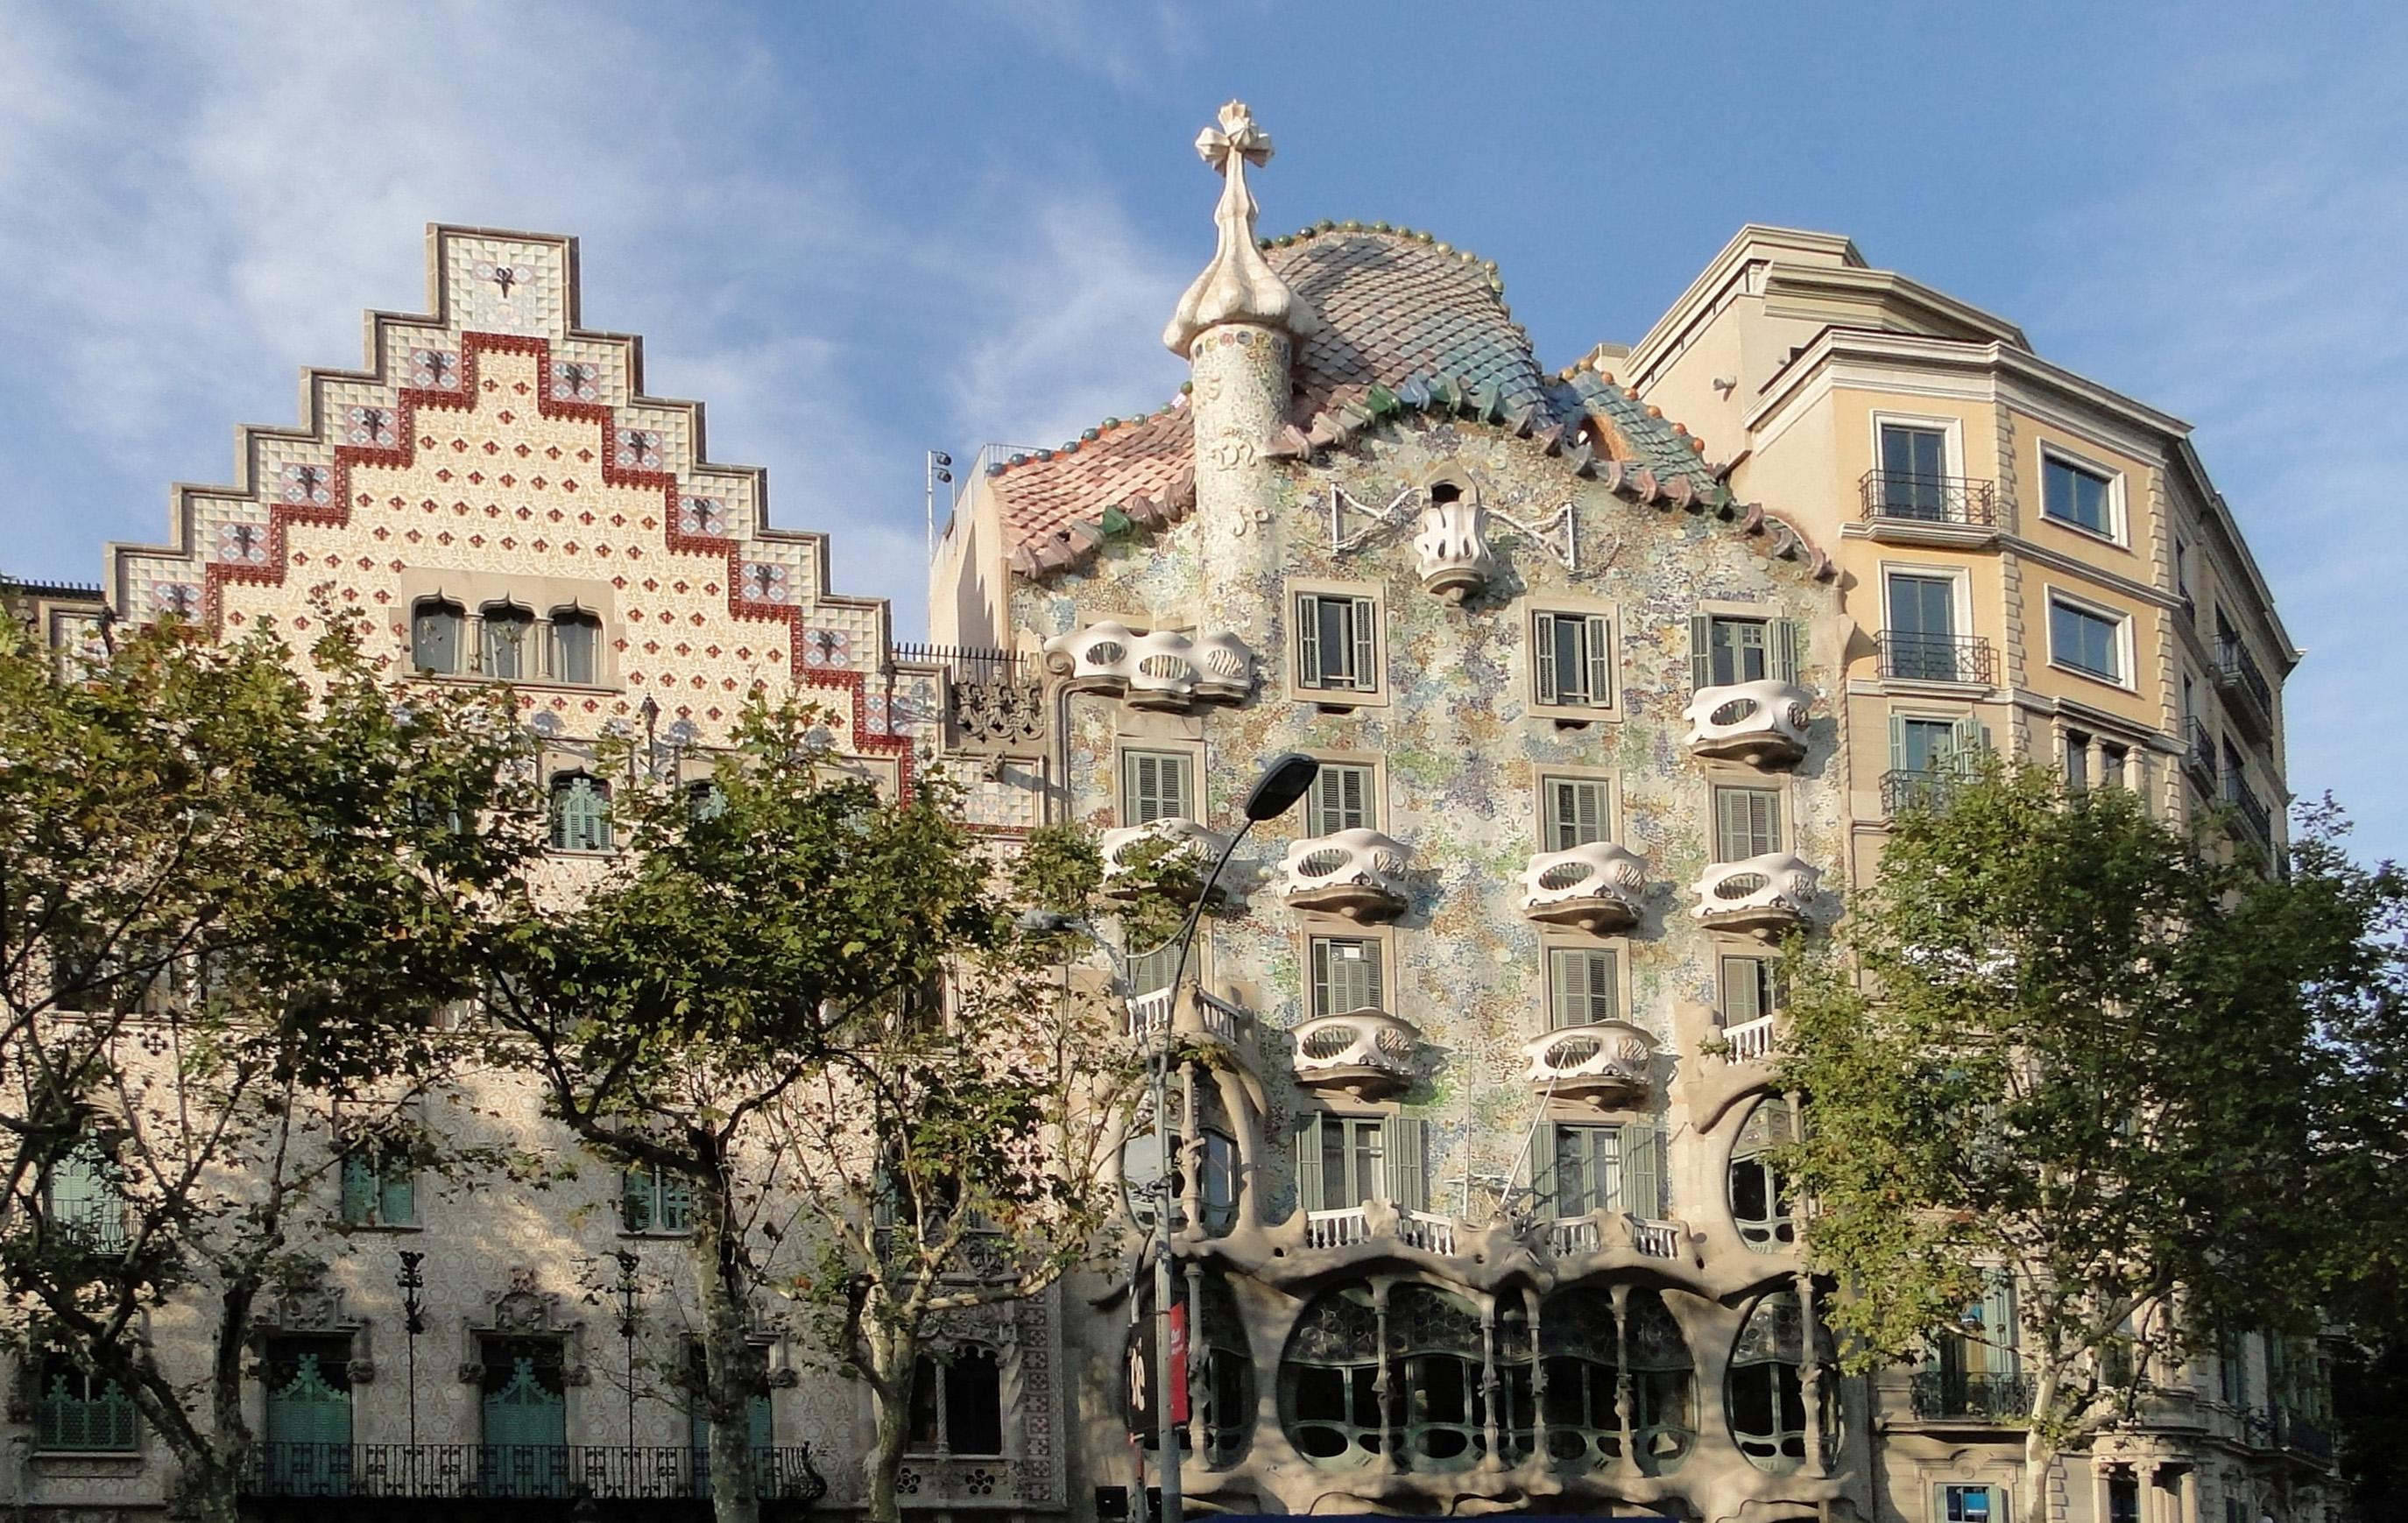 Casa_Amatller_and_Casa_Batlló